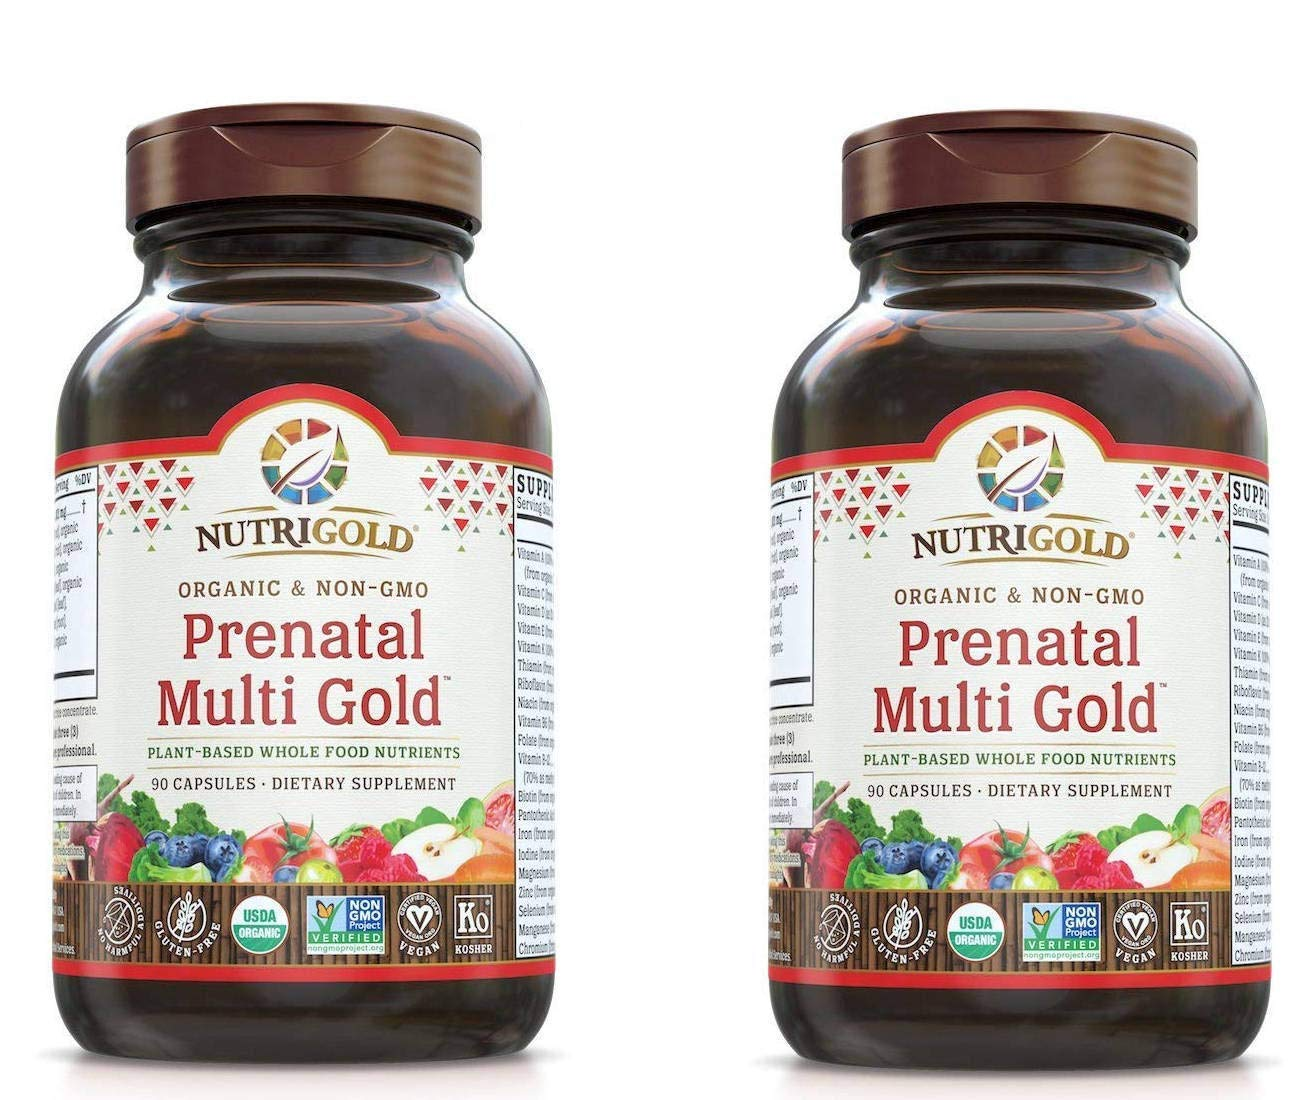 Nutrigold Prenatal Multi Gold Plant-Based Whole Food Nutrients (90 Vegan Capsules) Pack of 2